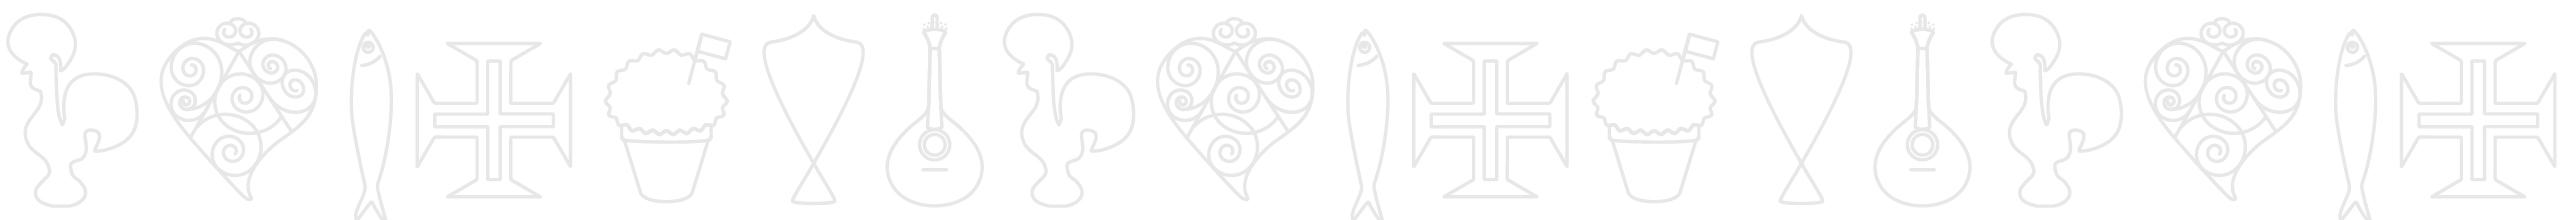 simbolos01